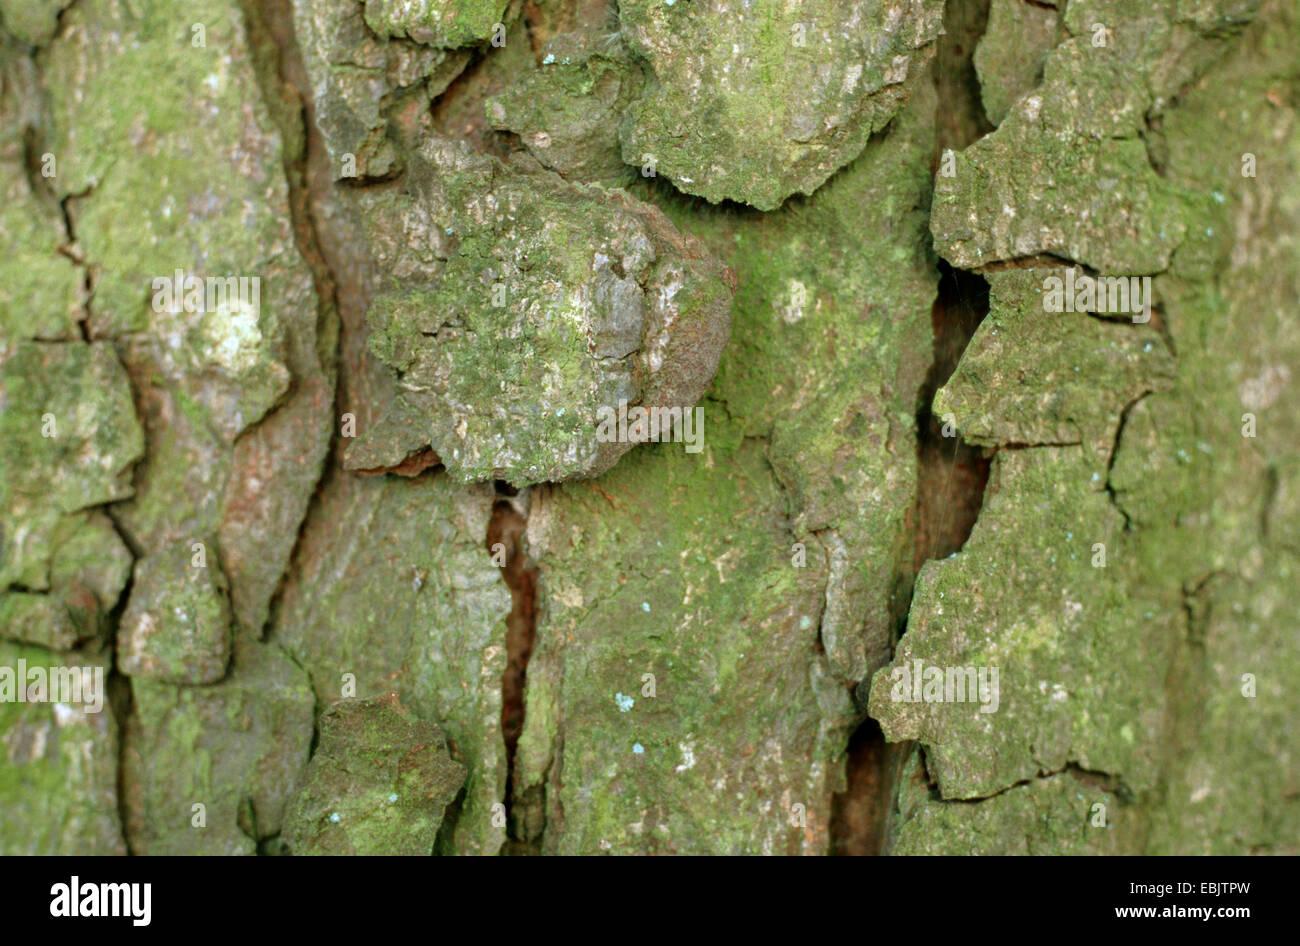 common horse chestnut (Aesculus hippocastanum), bark - Stock Image